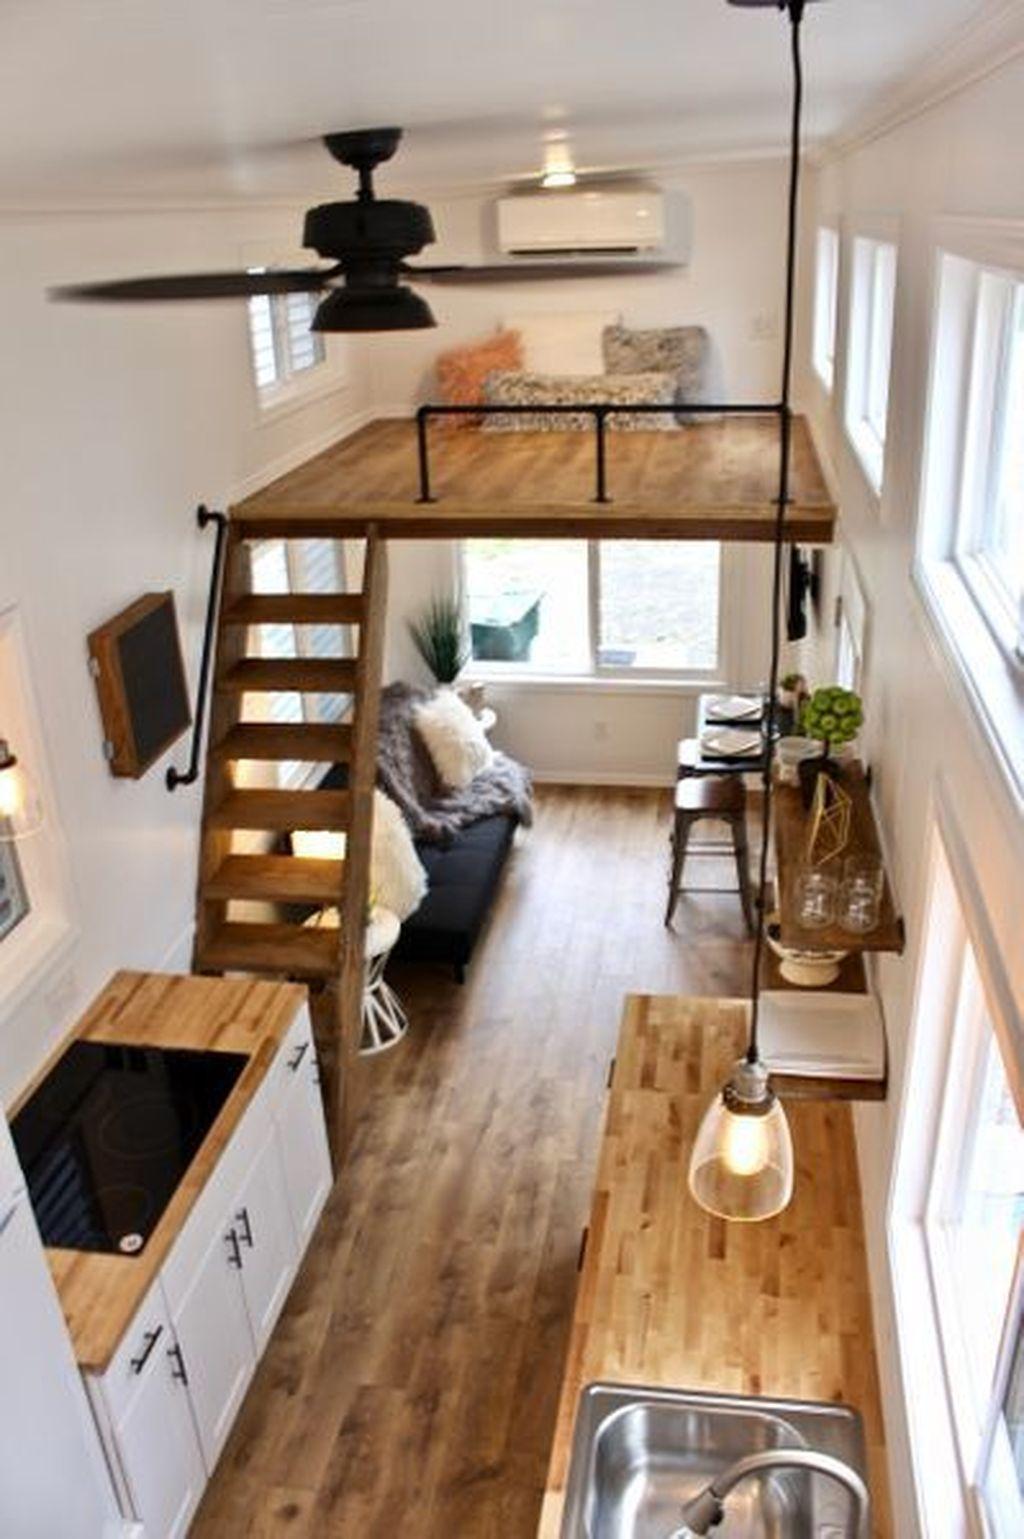 34 Fabulous Tiny House Design Ideas You Never Seen Before Homepiez Tiny House Loft Best Tiny House Tiny House Interior Design